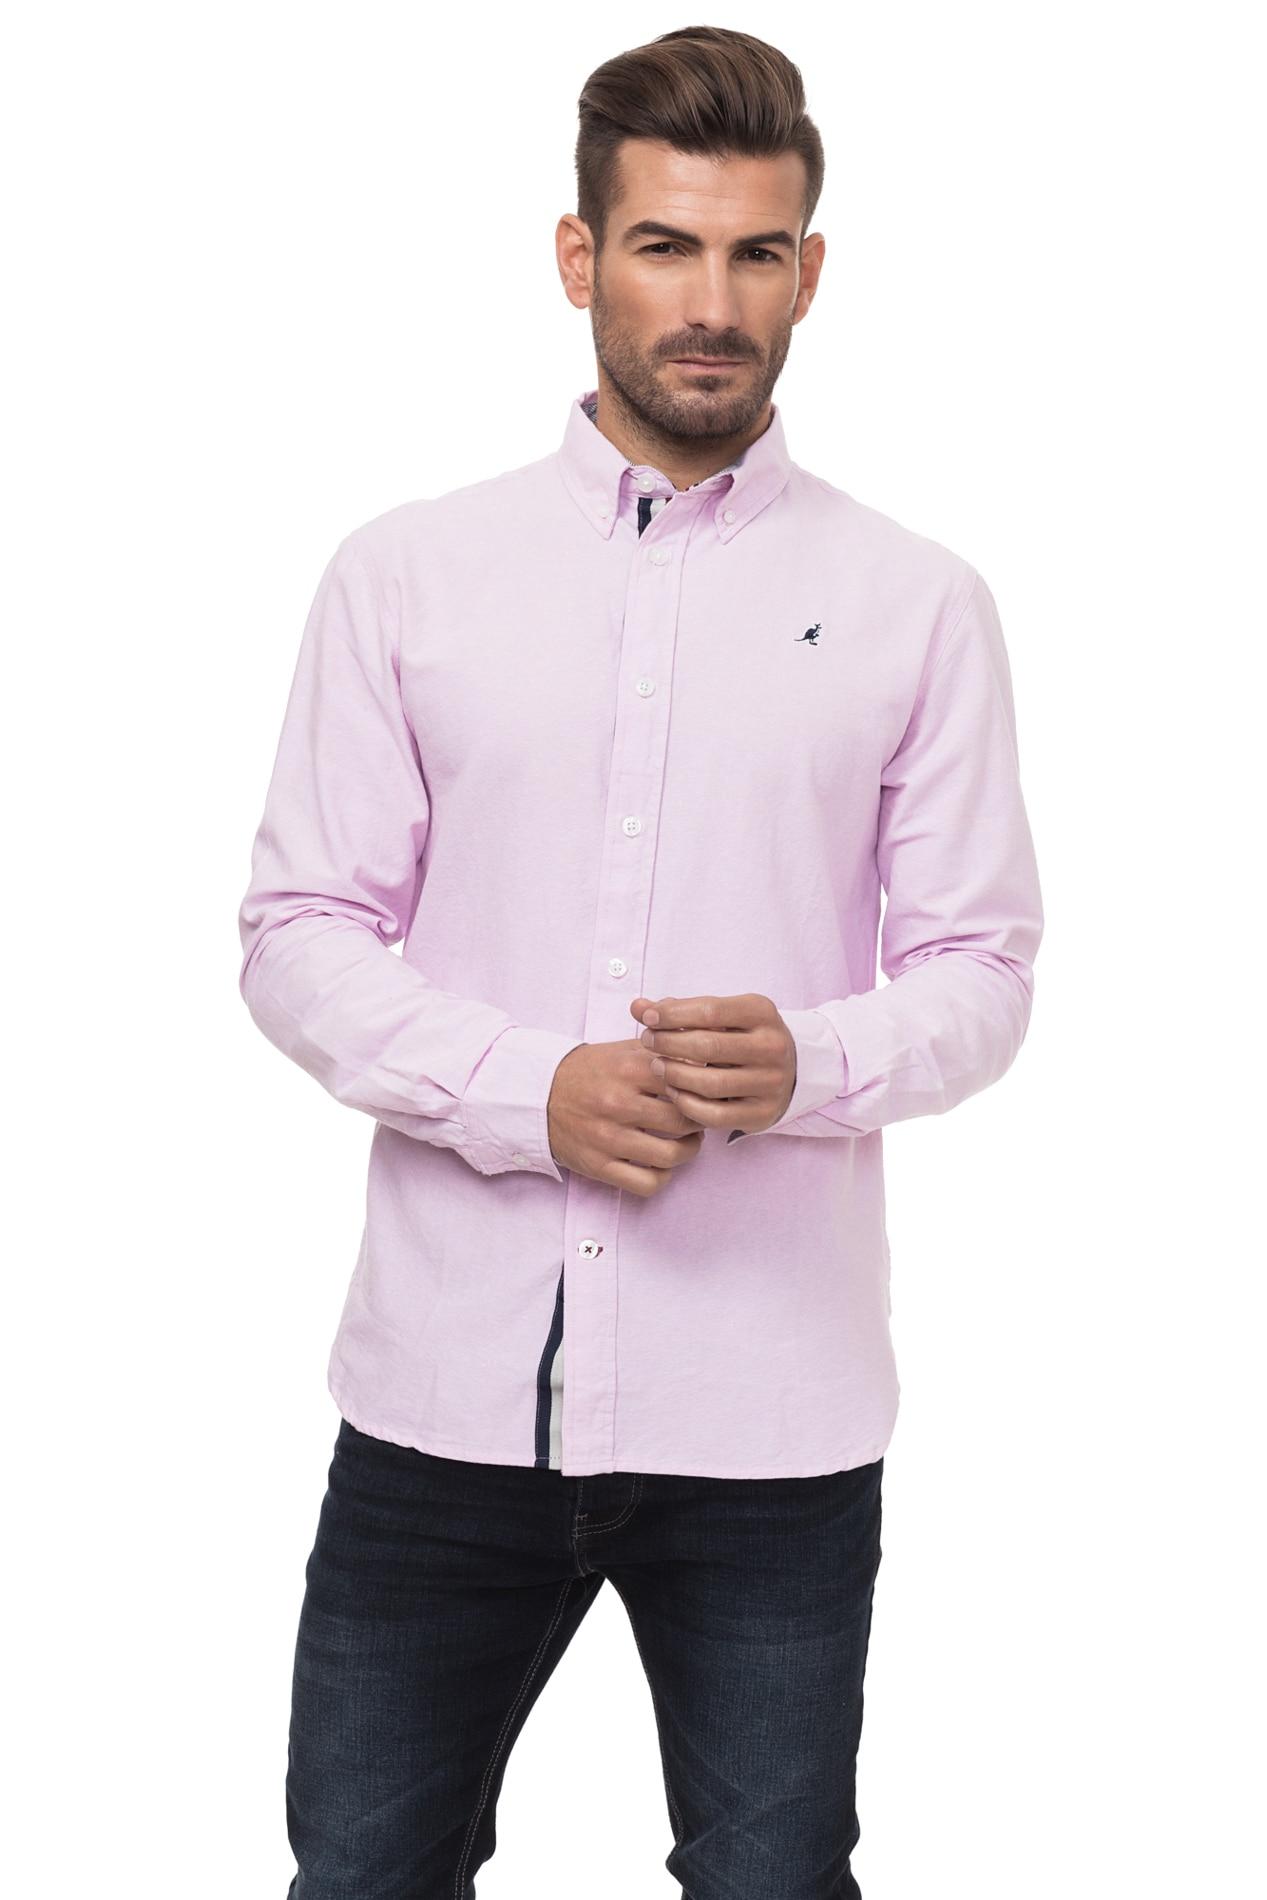 Kangol OXFORD MENS LS SHIRT Shirt's Men Color Blush Cotton KG2G112966AA2ABL-2